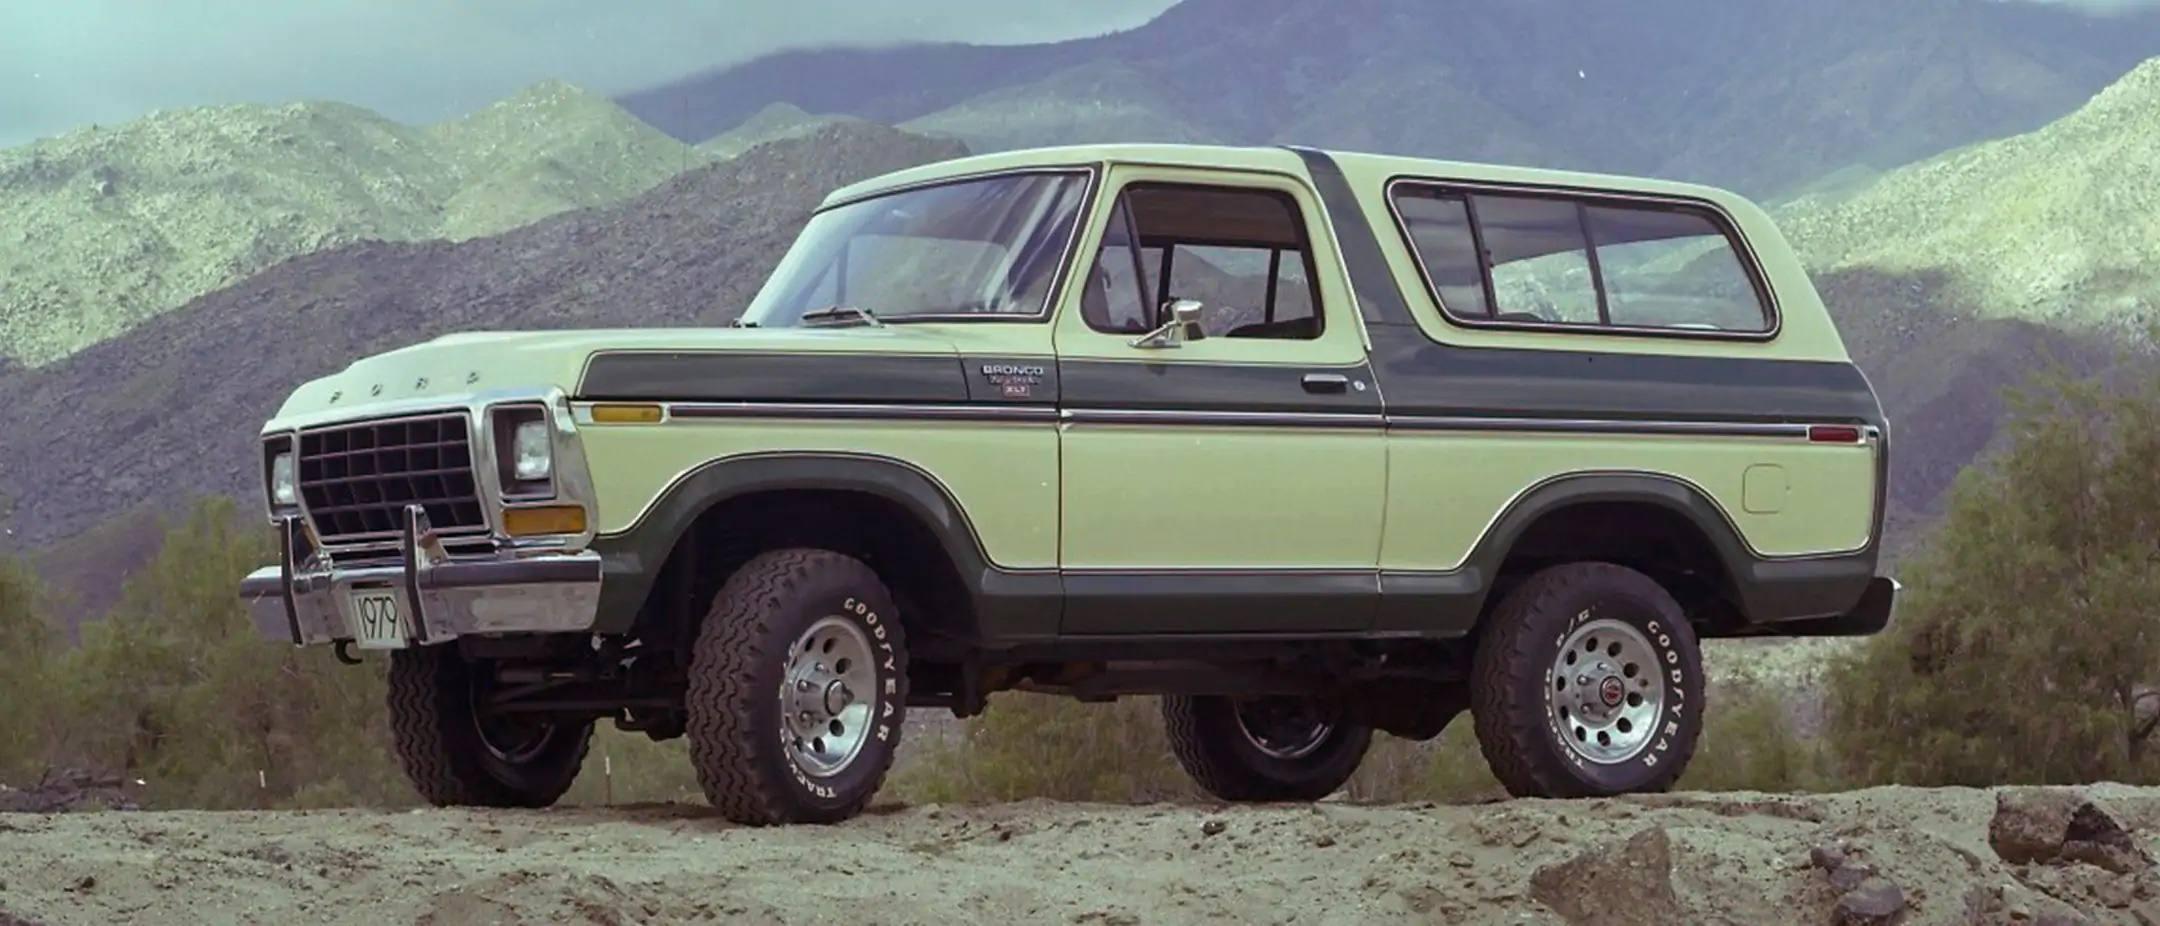 bronco-models-gen02-1978-crossover